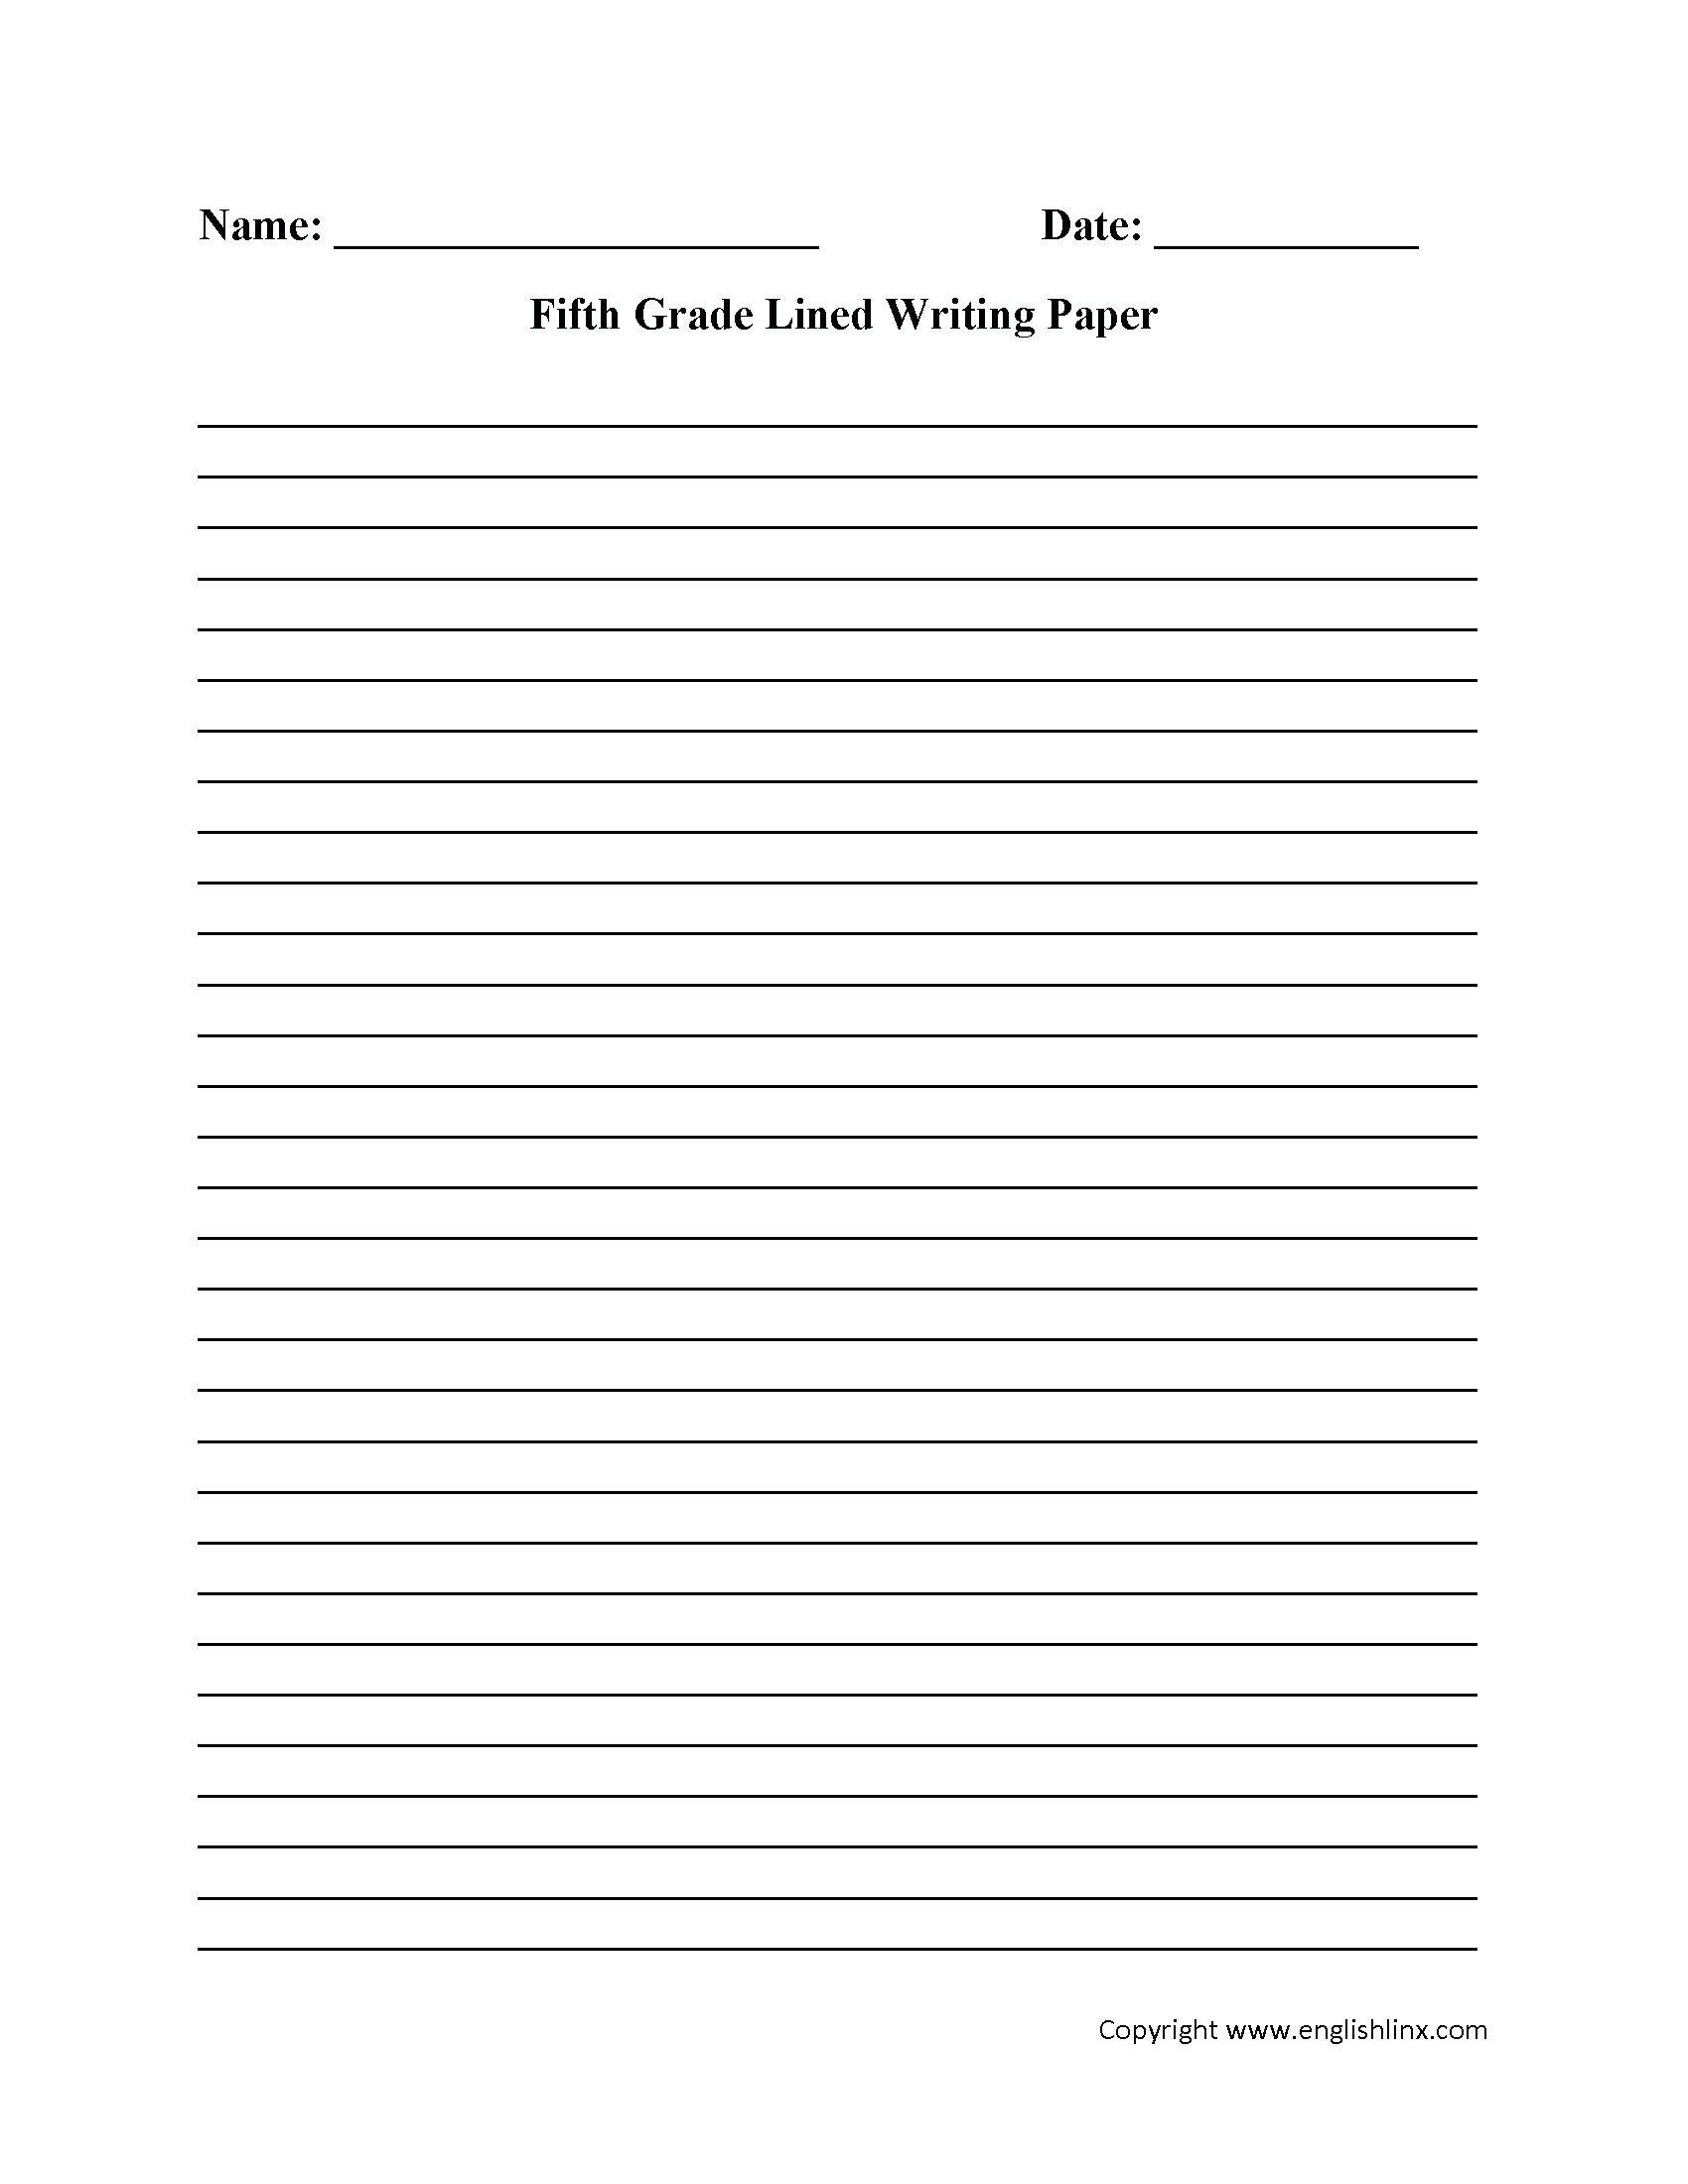 Cursive Handwriting Paper Free Cursive Writing Template Worksheet | Free Printable Handwriting Worksheets For First Grade